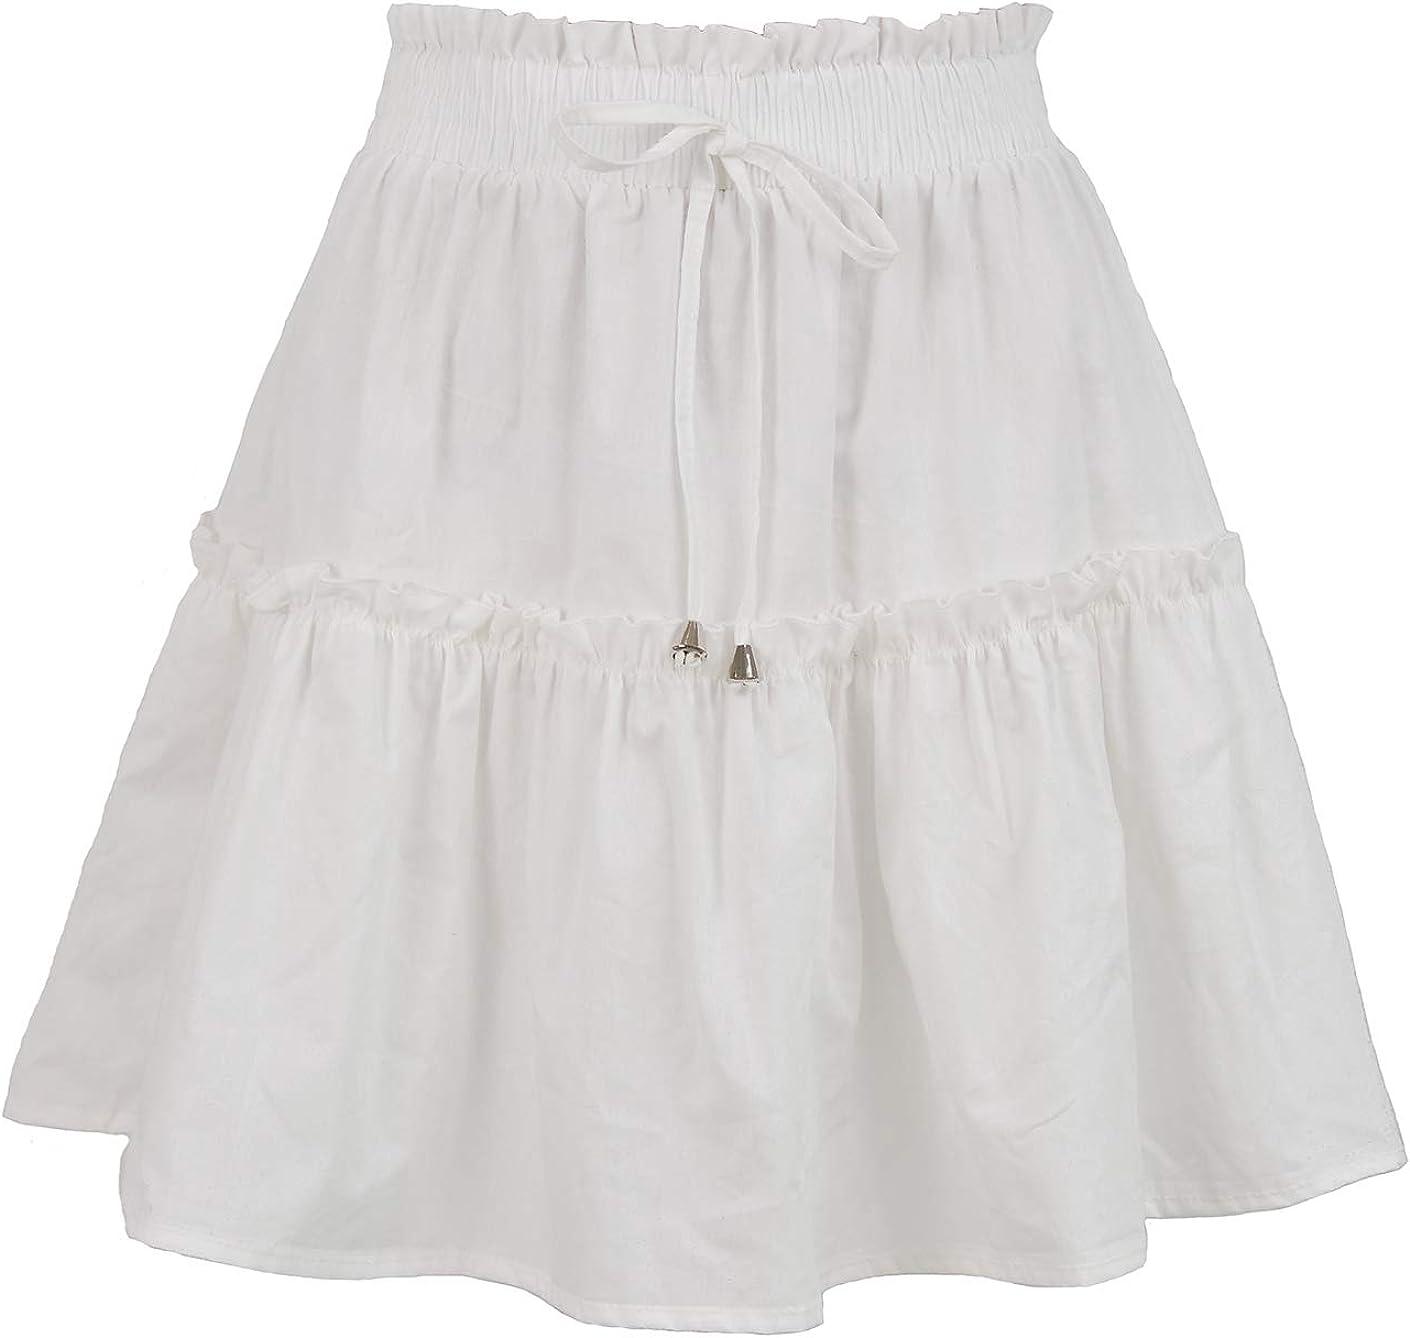 Summer Women's Mini Skirt High Waist A Line Skirt Casual Ruffle Drawstring Skater Pleated Short Skirt with Drawstring